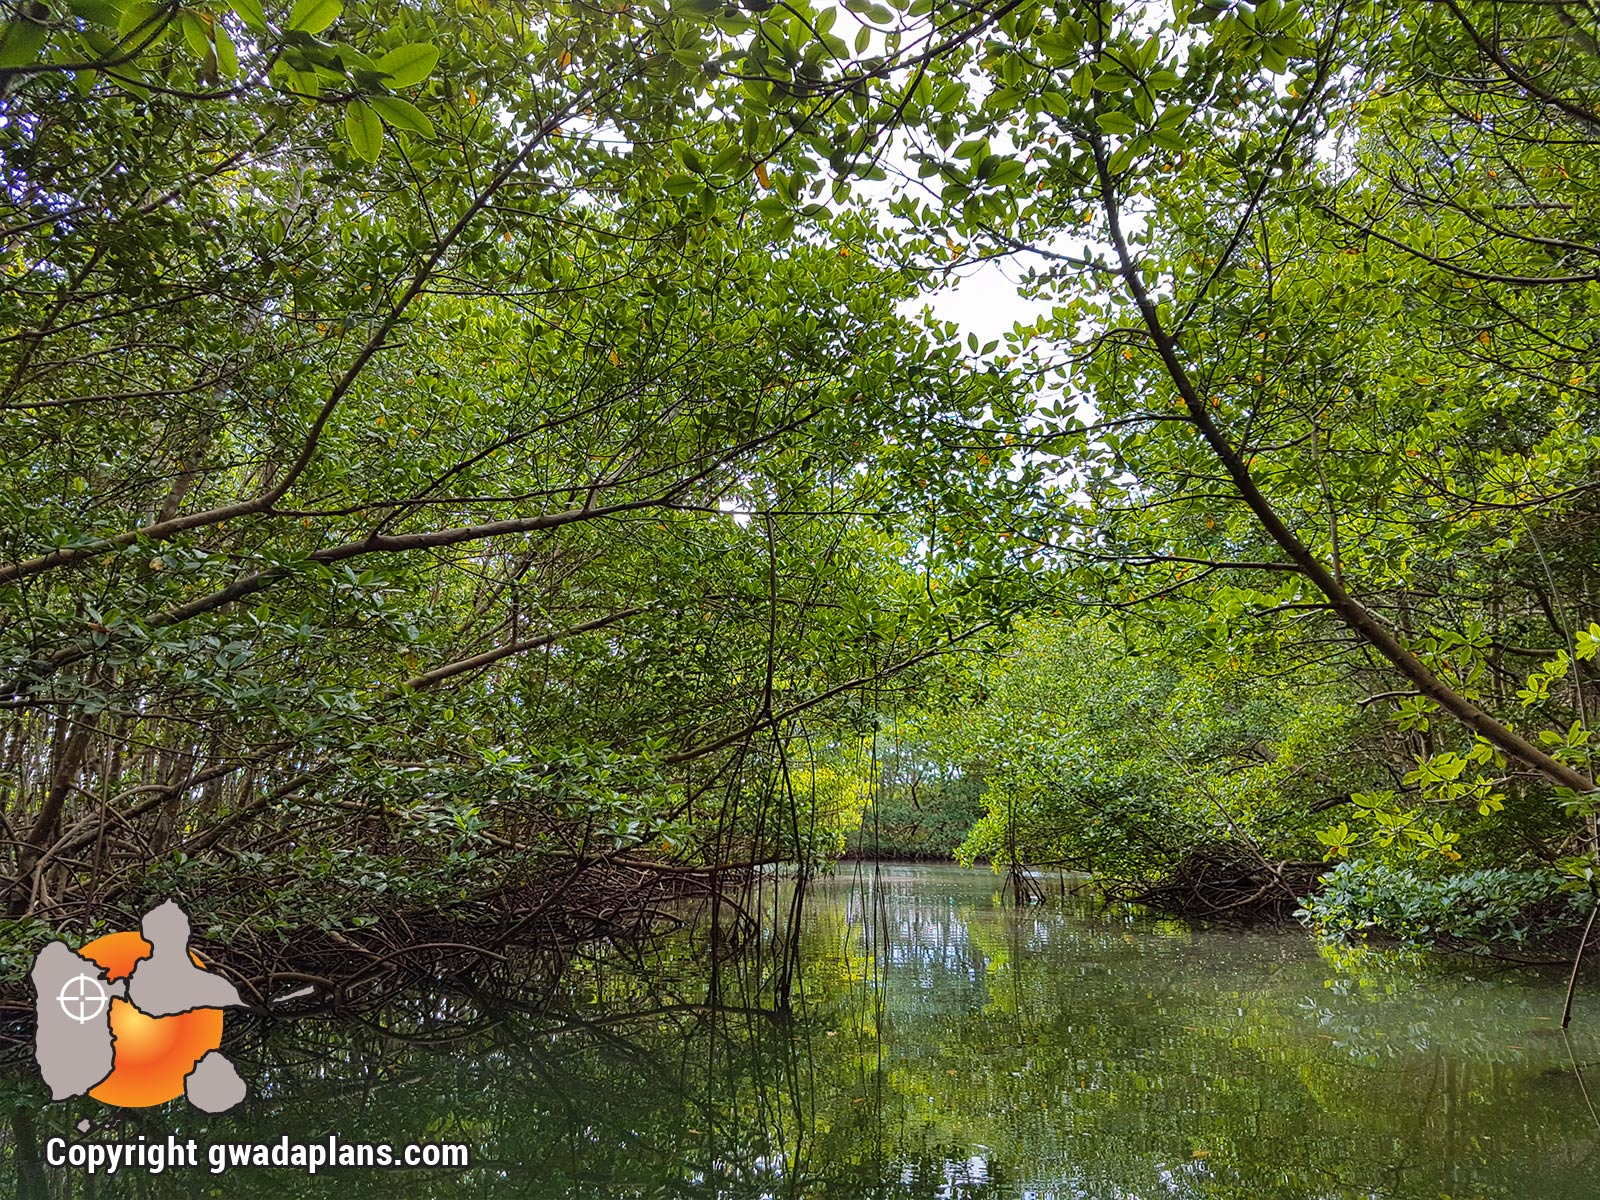 Réserve Marine Guadeloupe - Mangrove